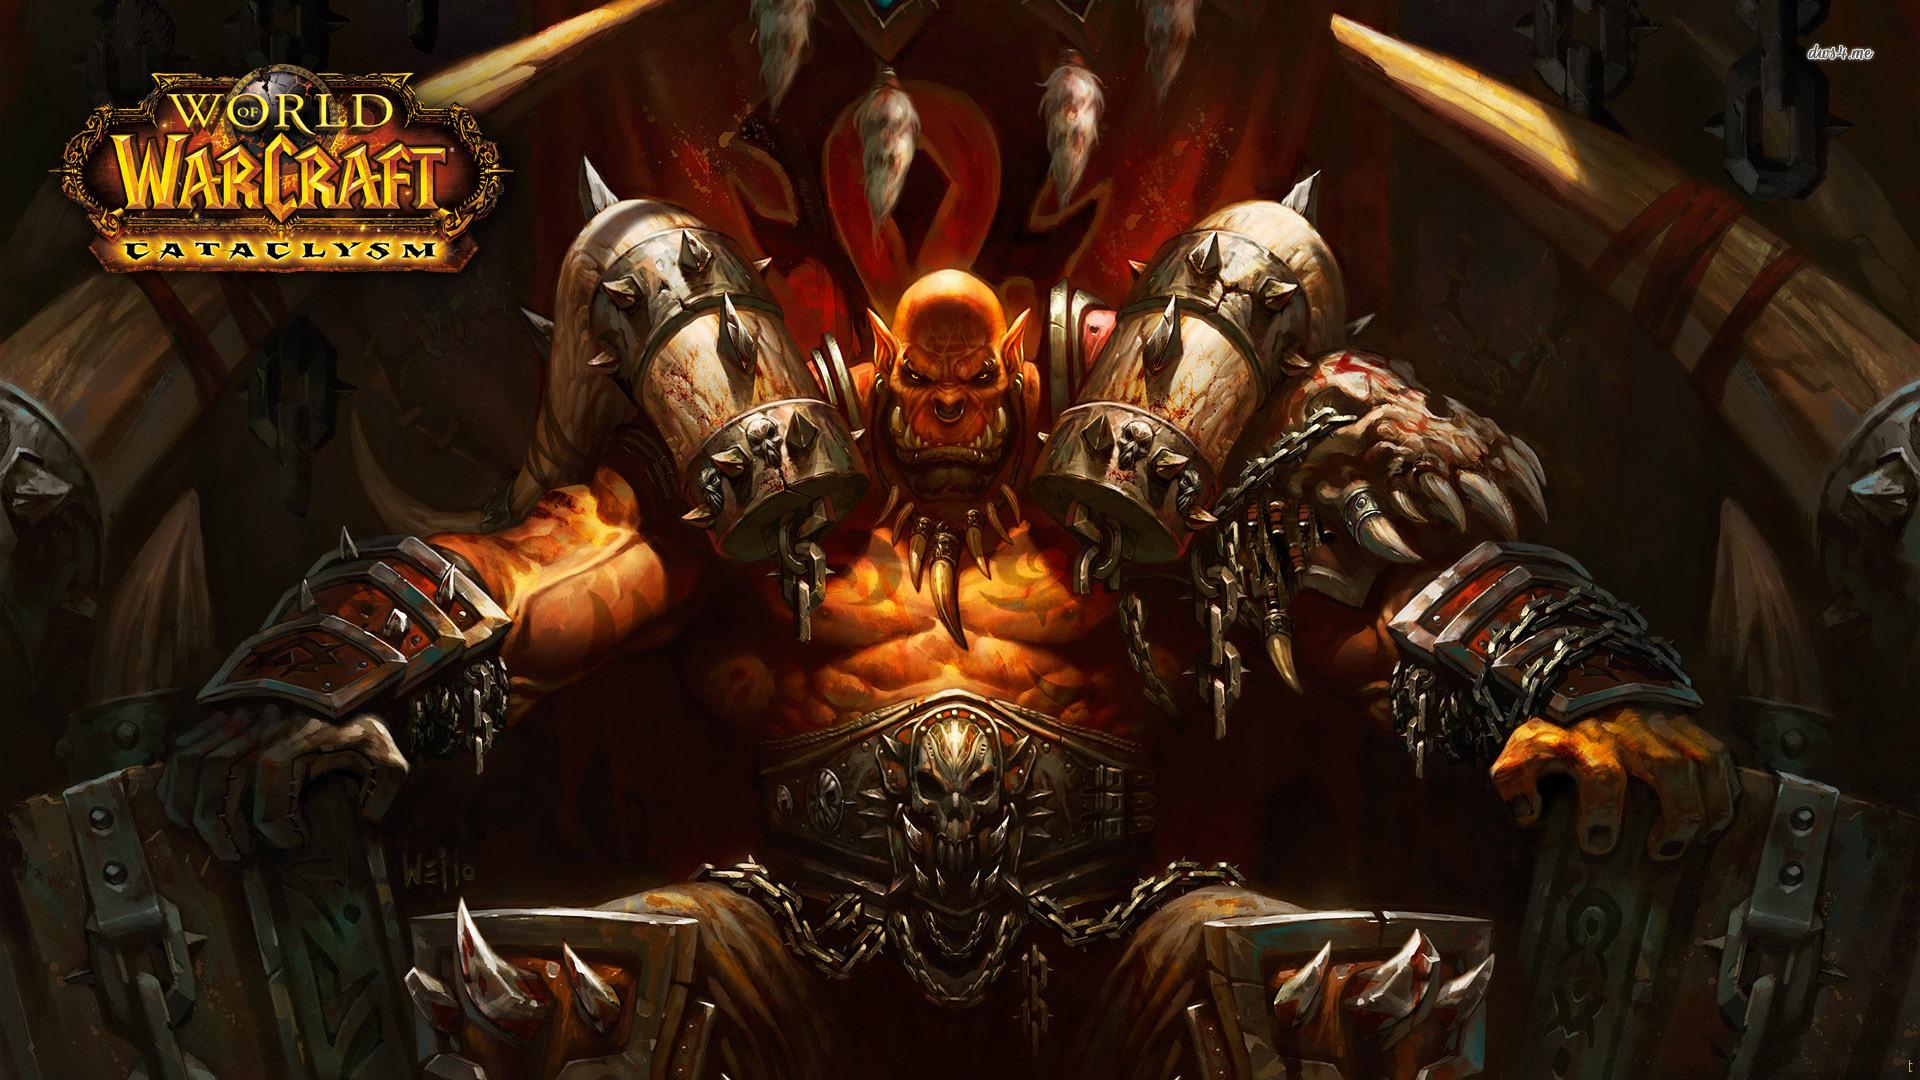 World of Warcraft wallpaper 1280x800 World of Warcraft wallpaper 1920x1080